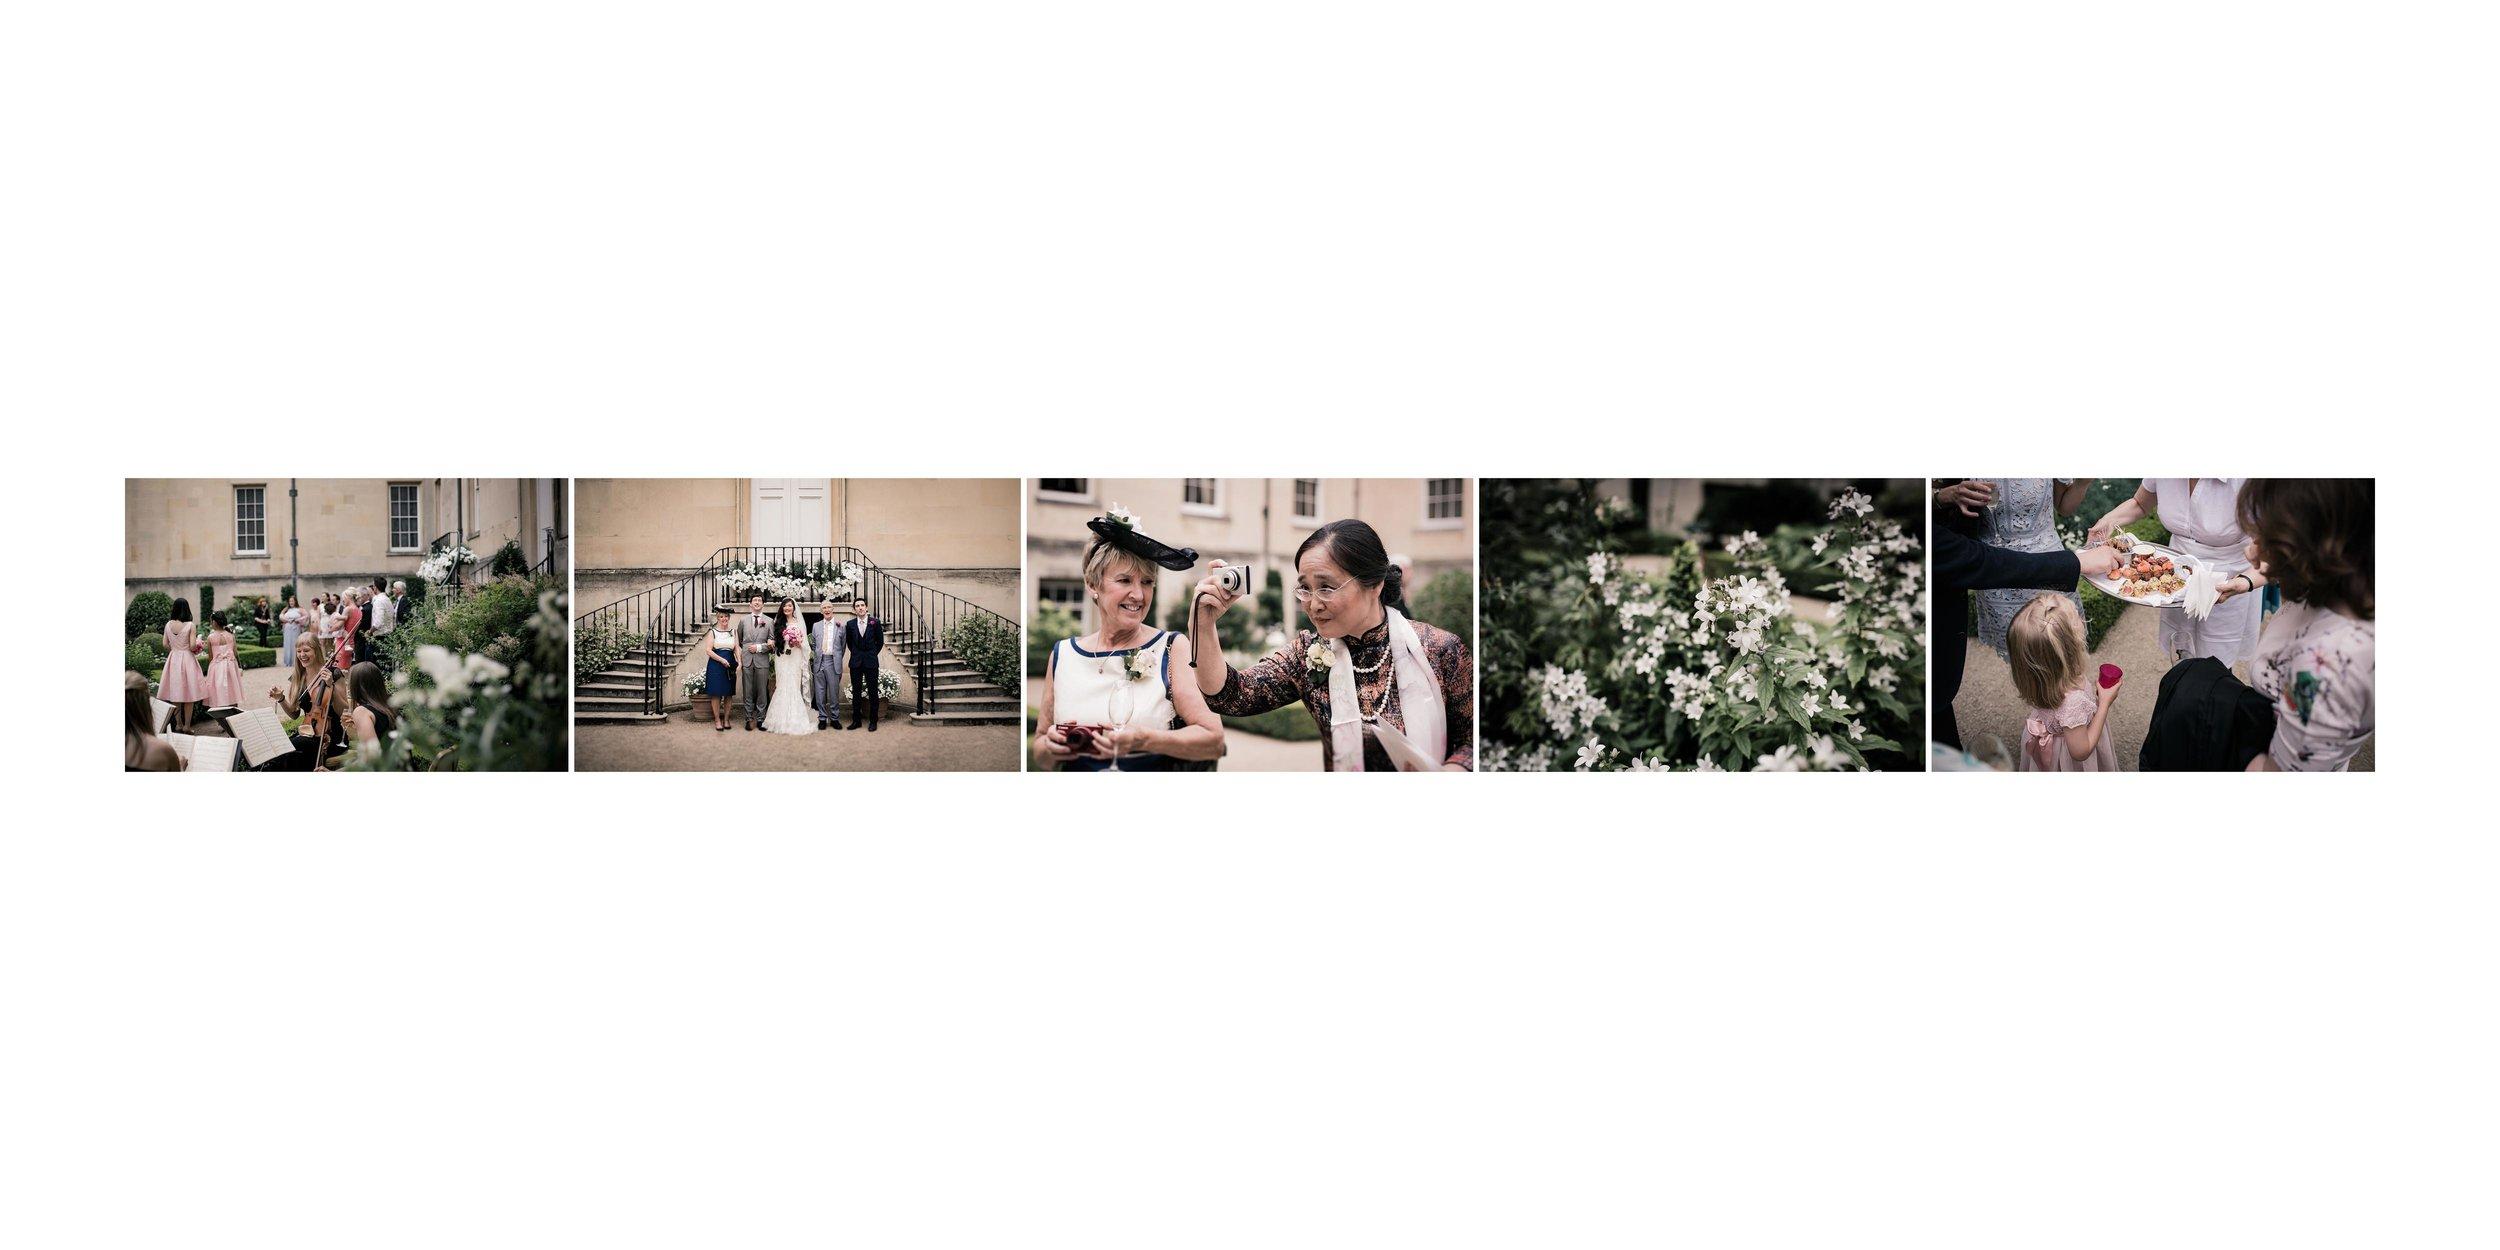 wedding_photographer_surrey_33.jpg